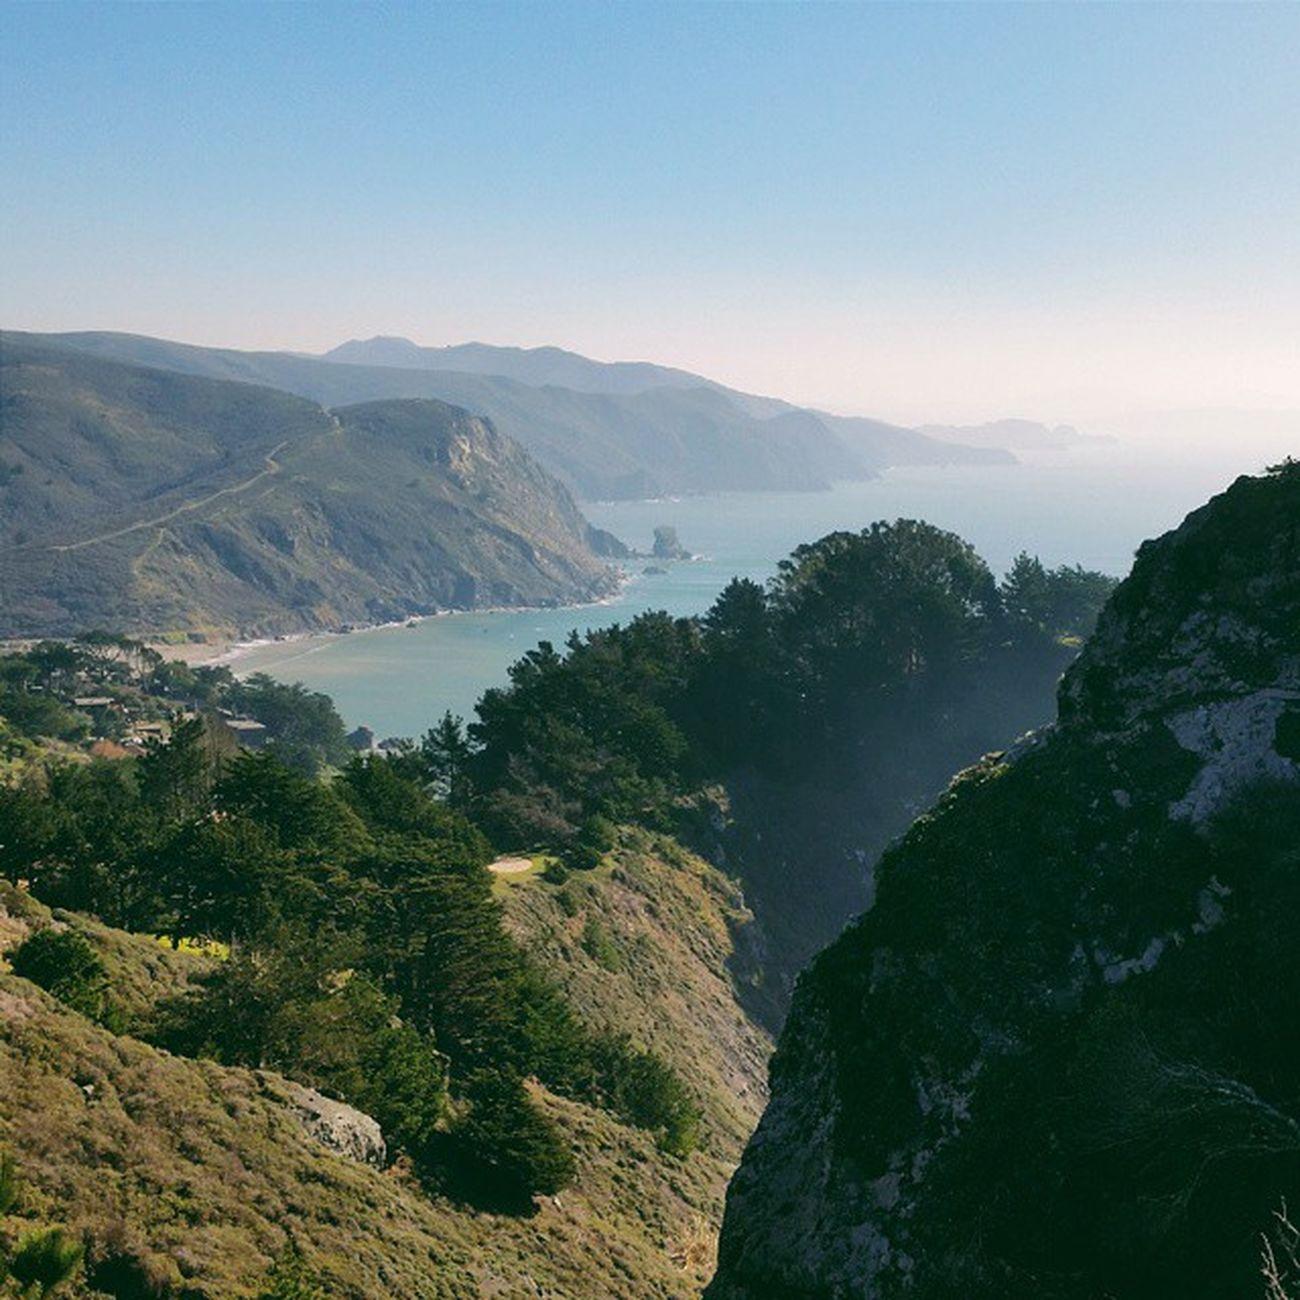 There's no coast quite like the West Coast. Muirbeachoverlook Muirbeach Bolinas California marin hiking coastalcalifornia